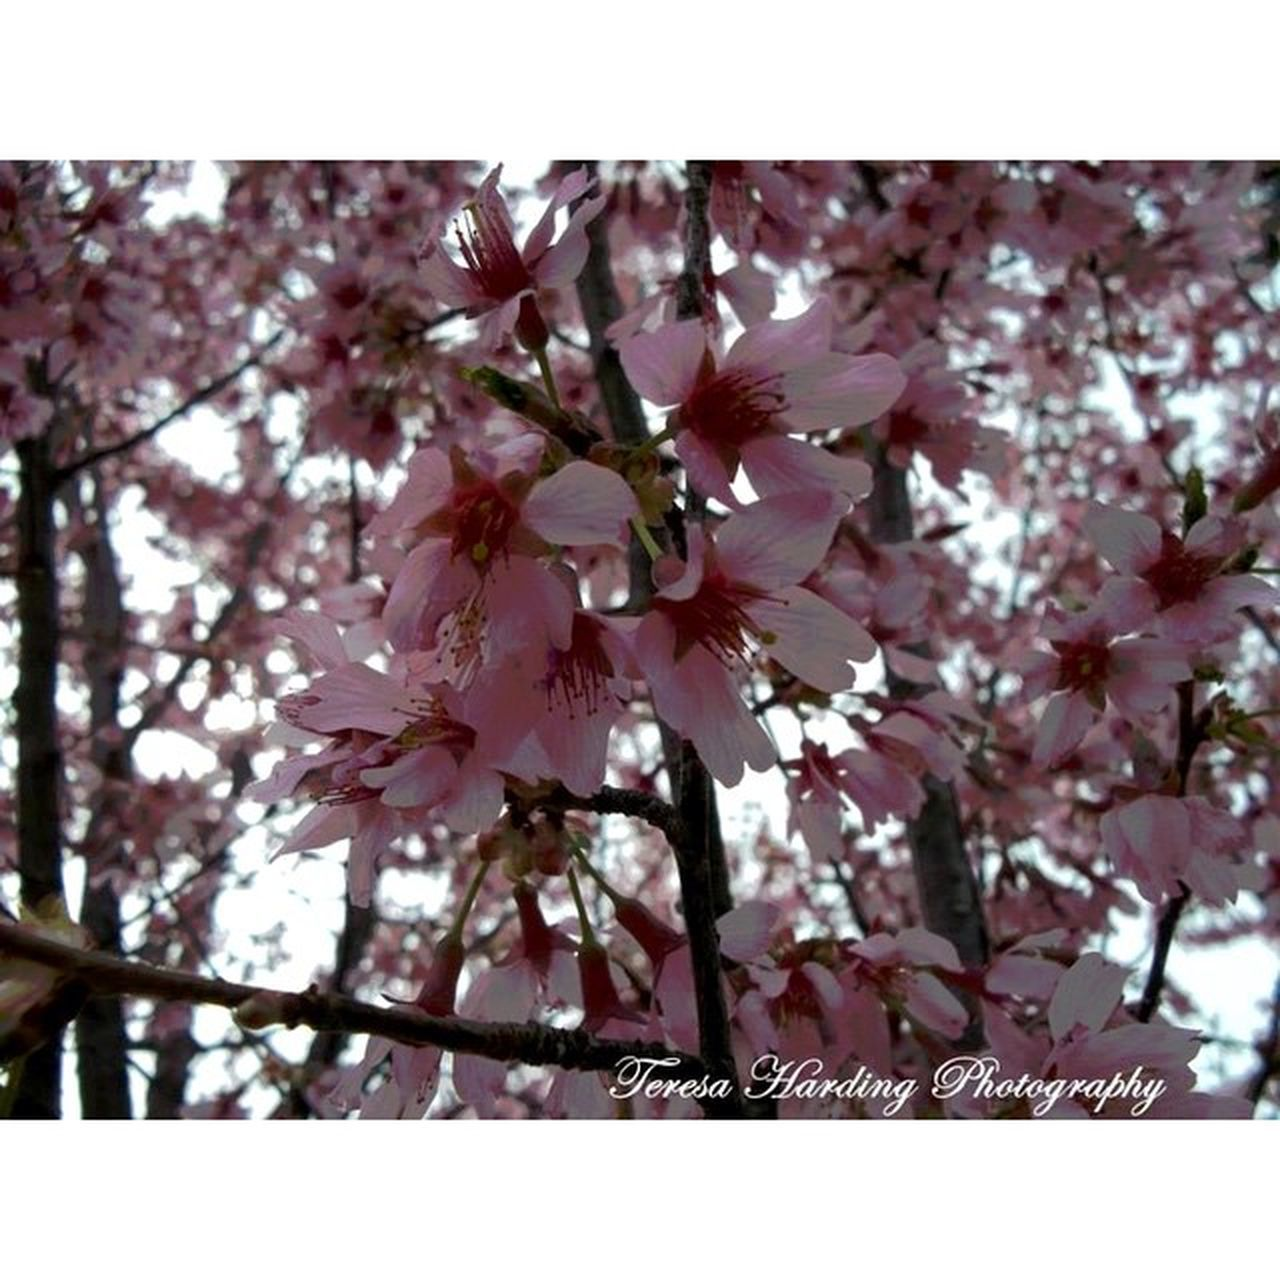 Canvasfilter Instasize Nature Flowers TeresaHardingPhotography